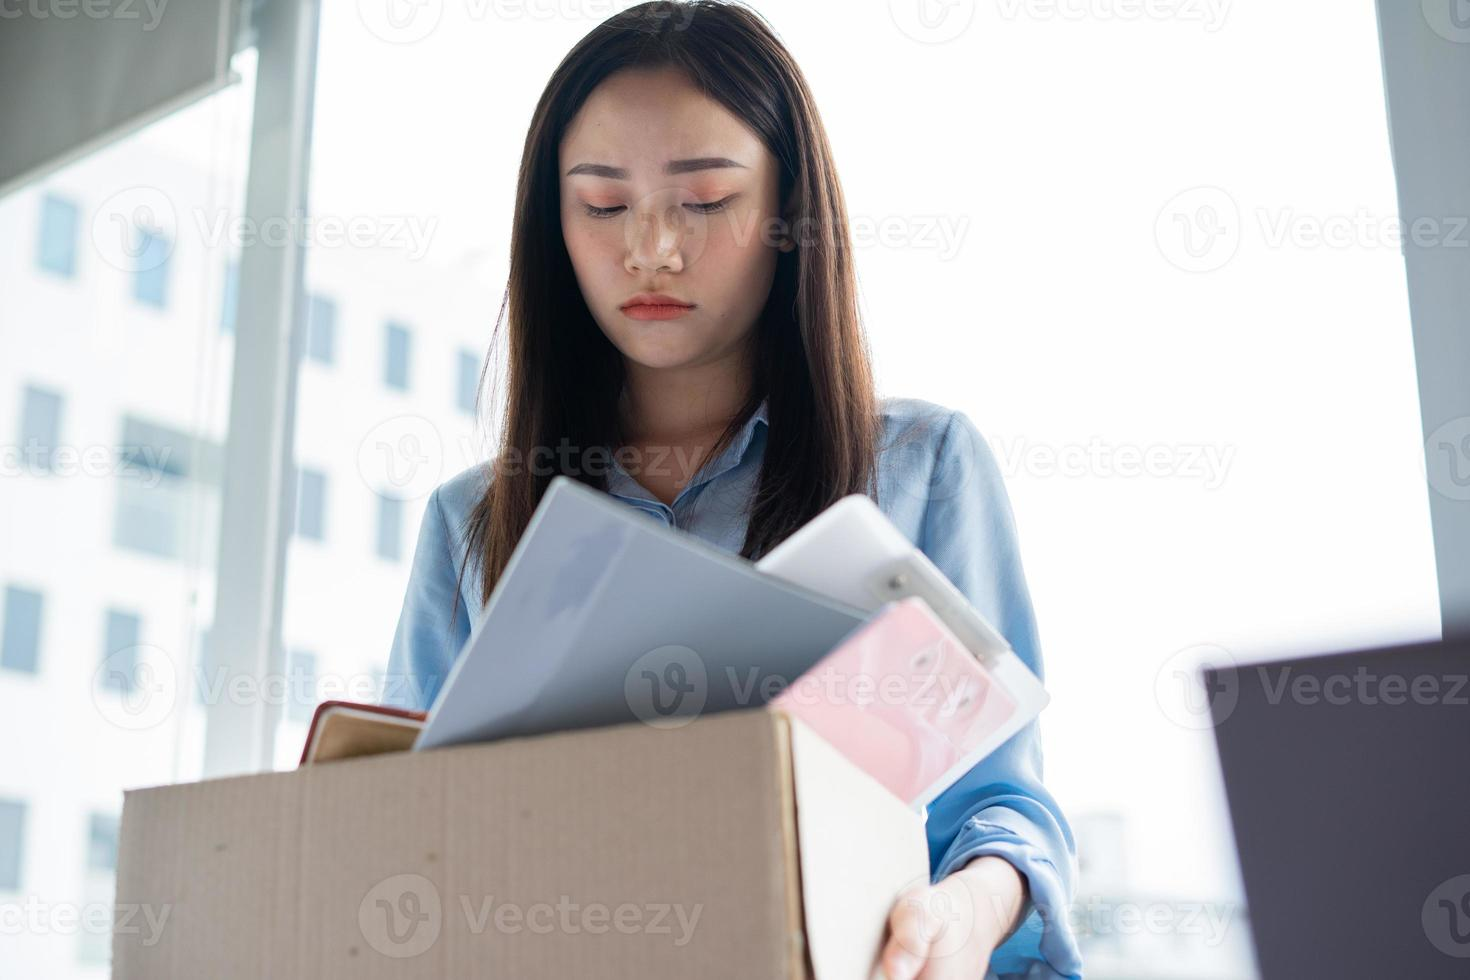 la donna asiatica è depressa perché è stata licenziata foto